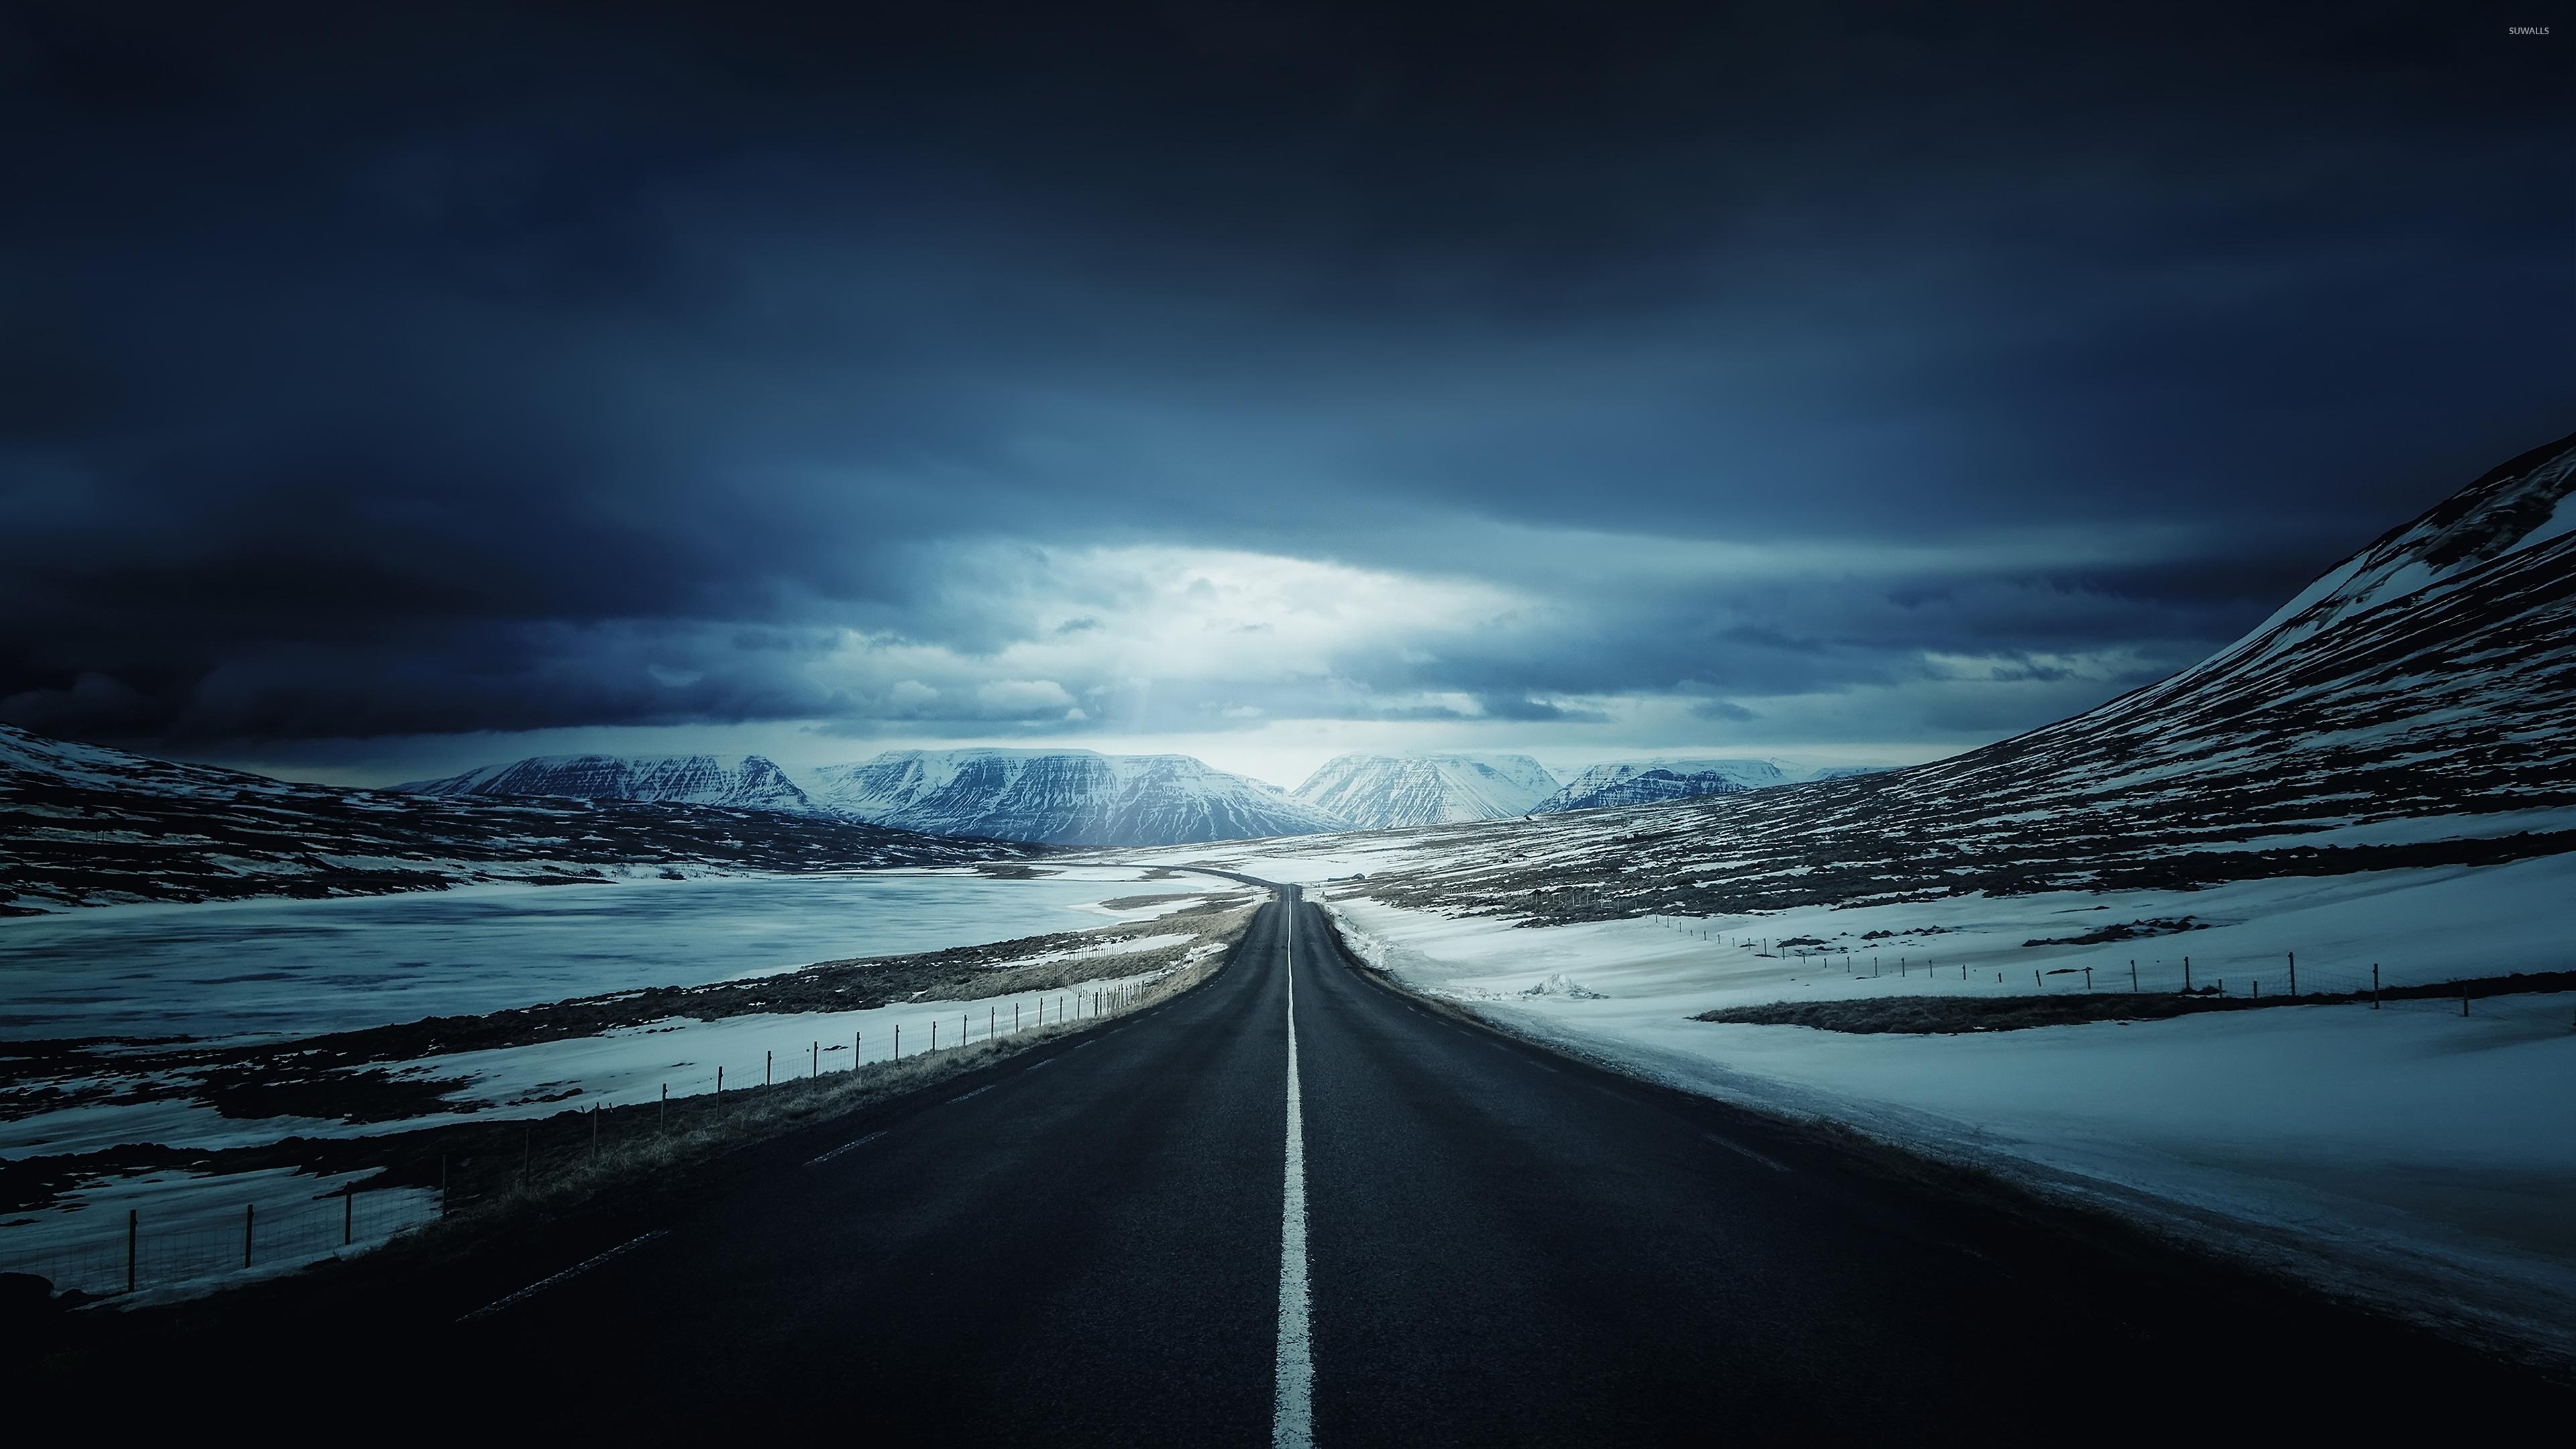 towards the snowy - photo #3